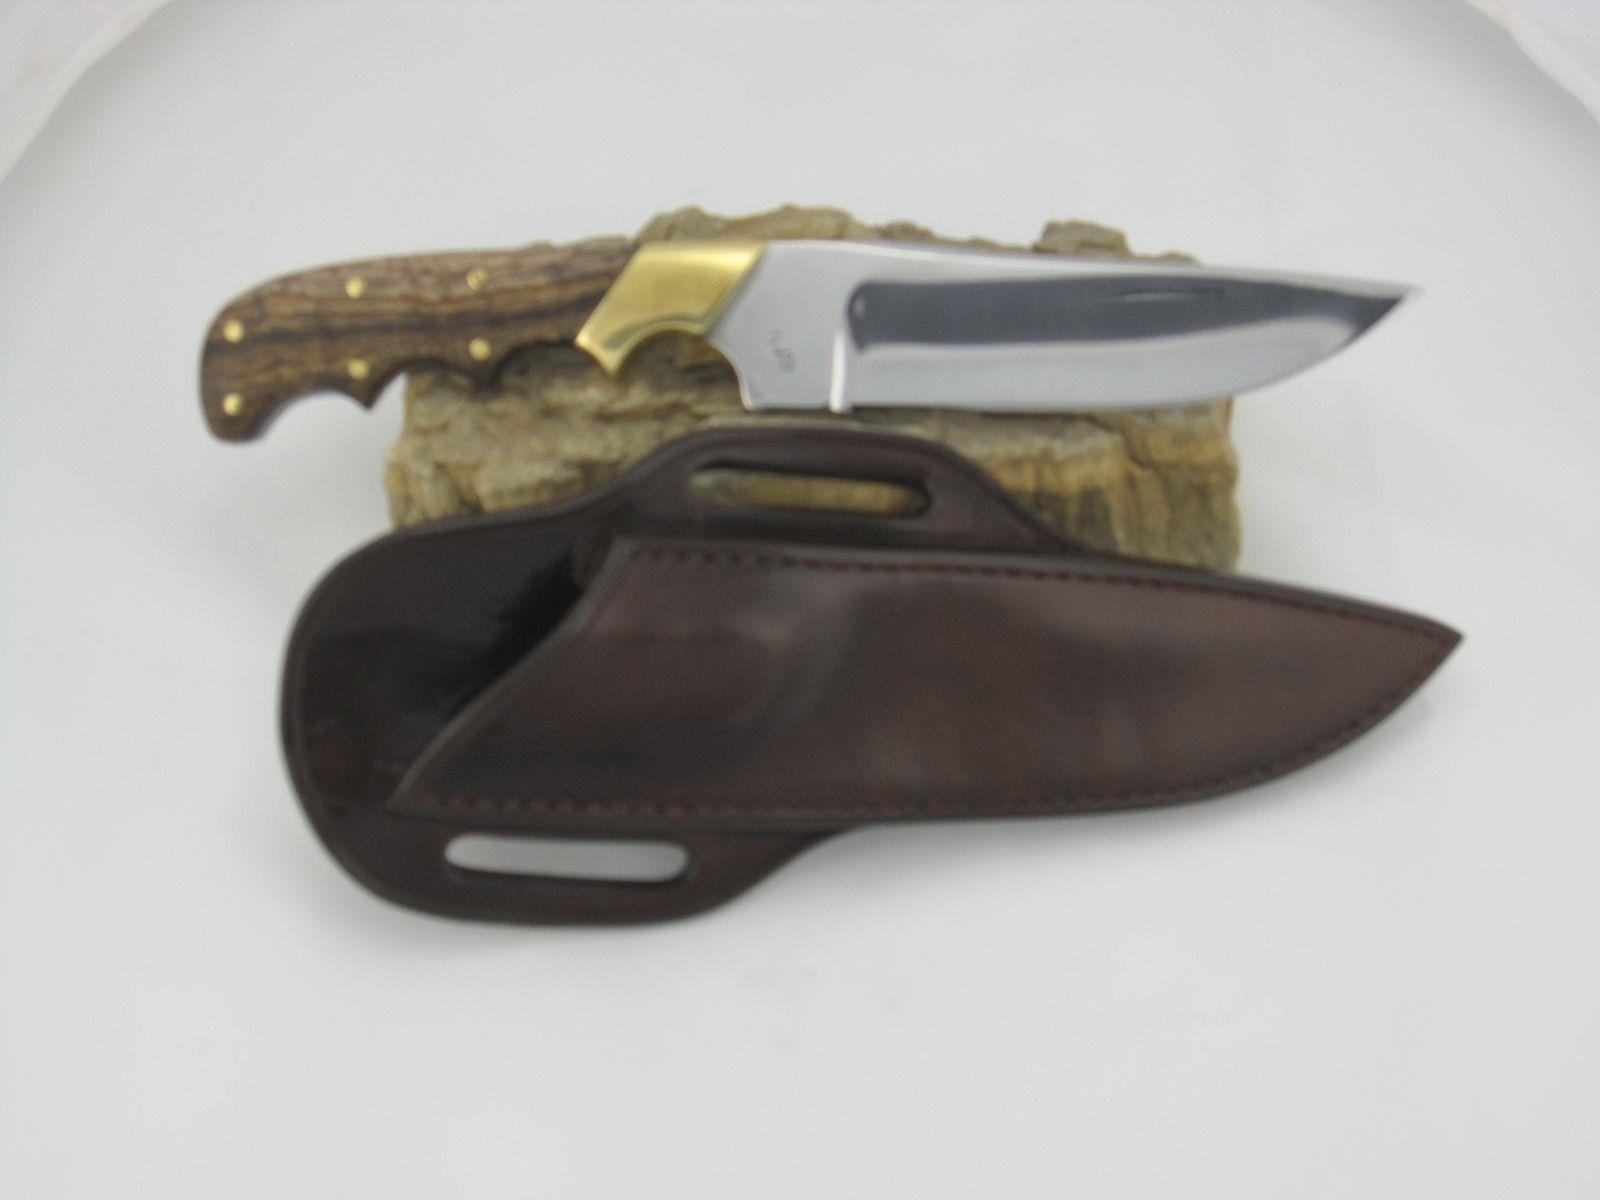 Hand Crafted Right Hand Cross Draw Custom Knife Sheath By Circle Bar